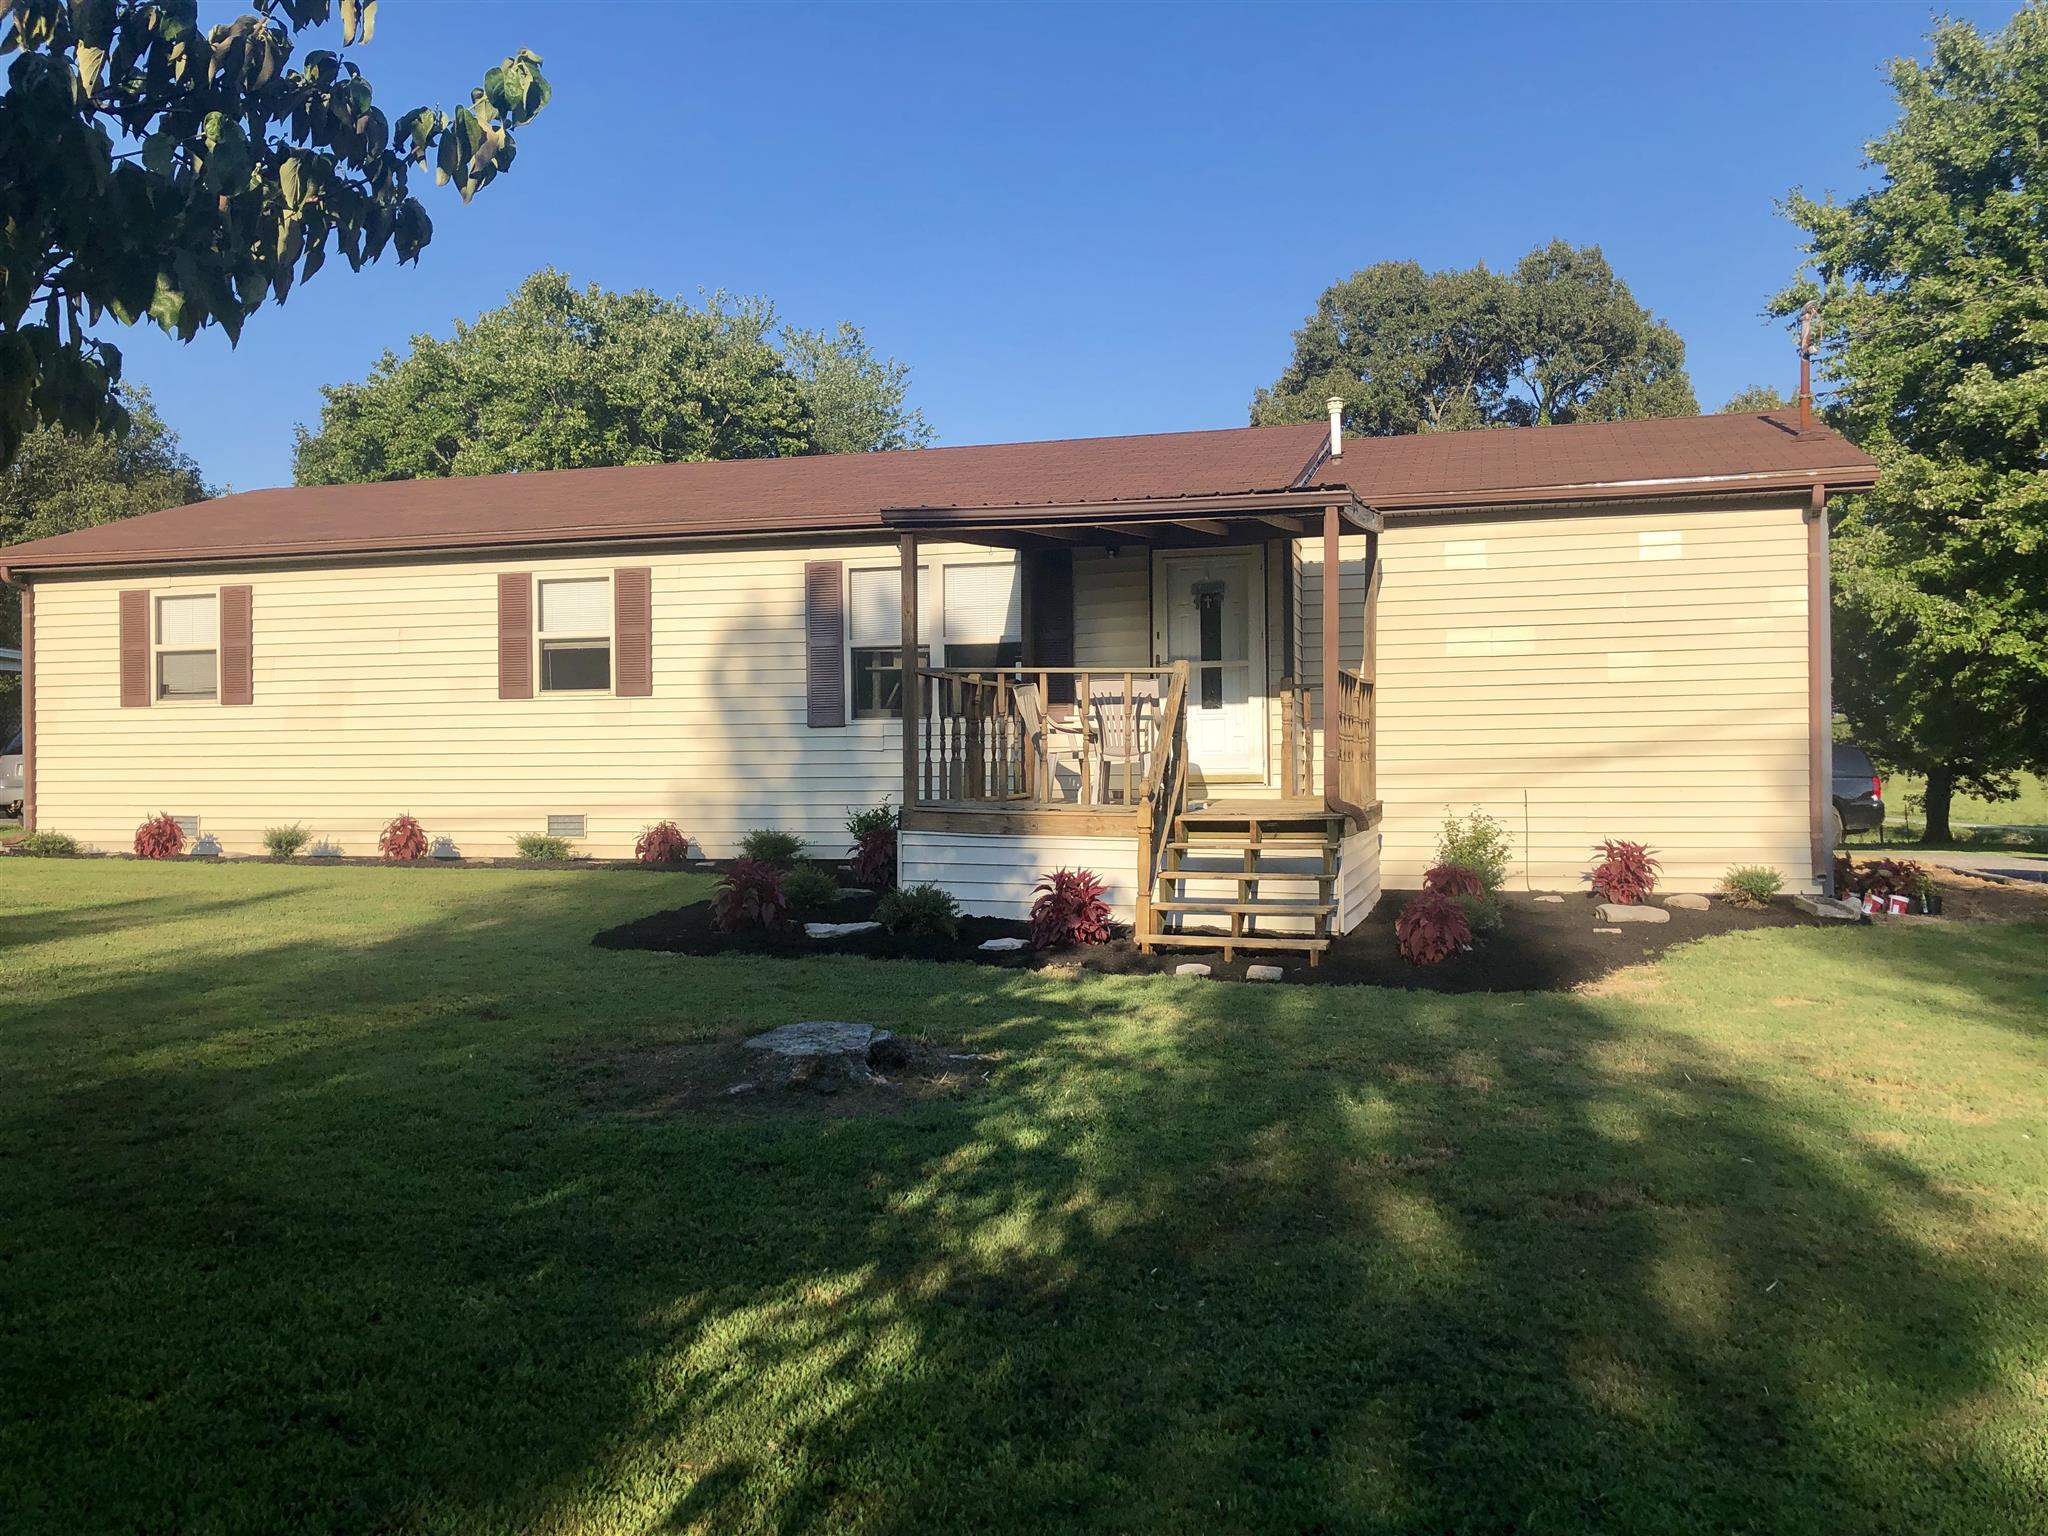 186 Rodonna Dr, Smithville, TN 37166 - Smithville, TN real estate listing